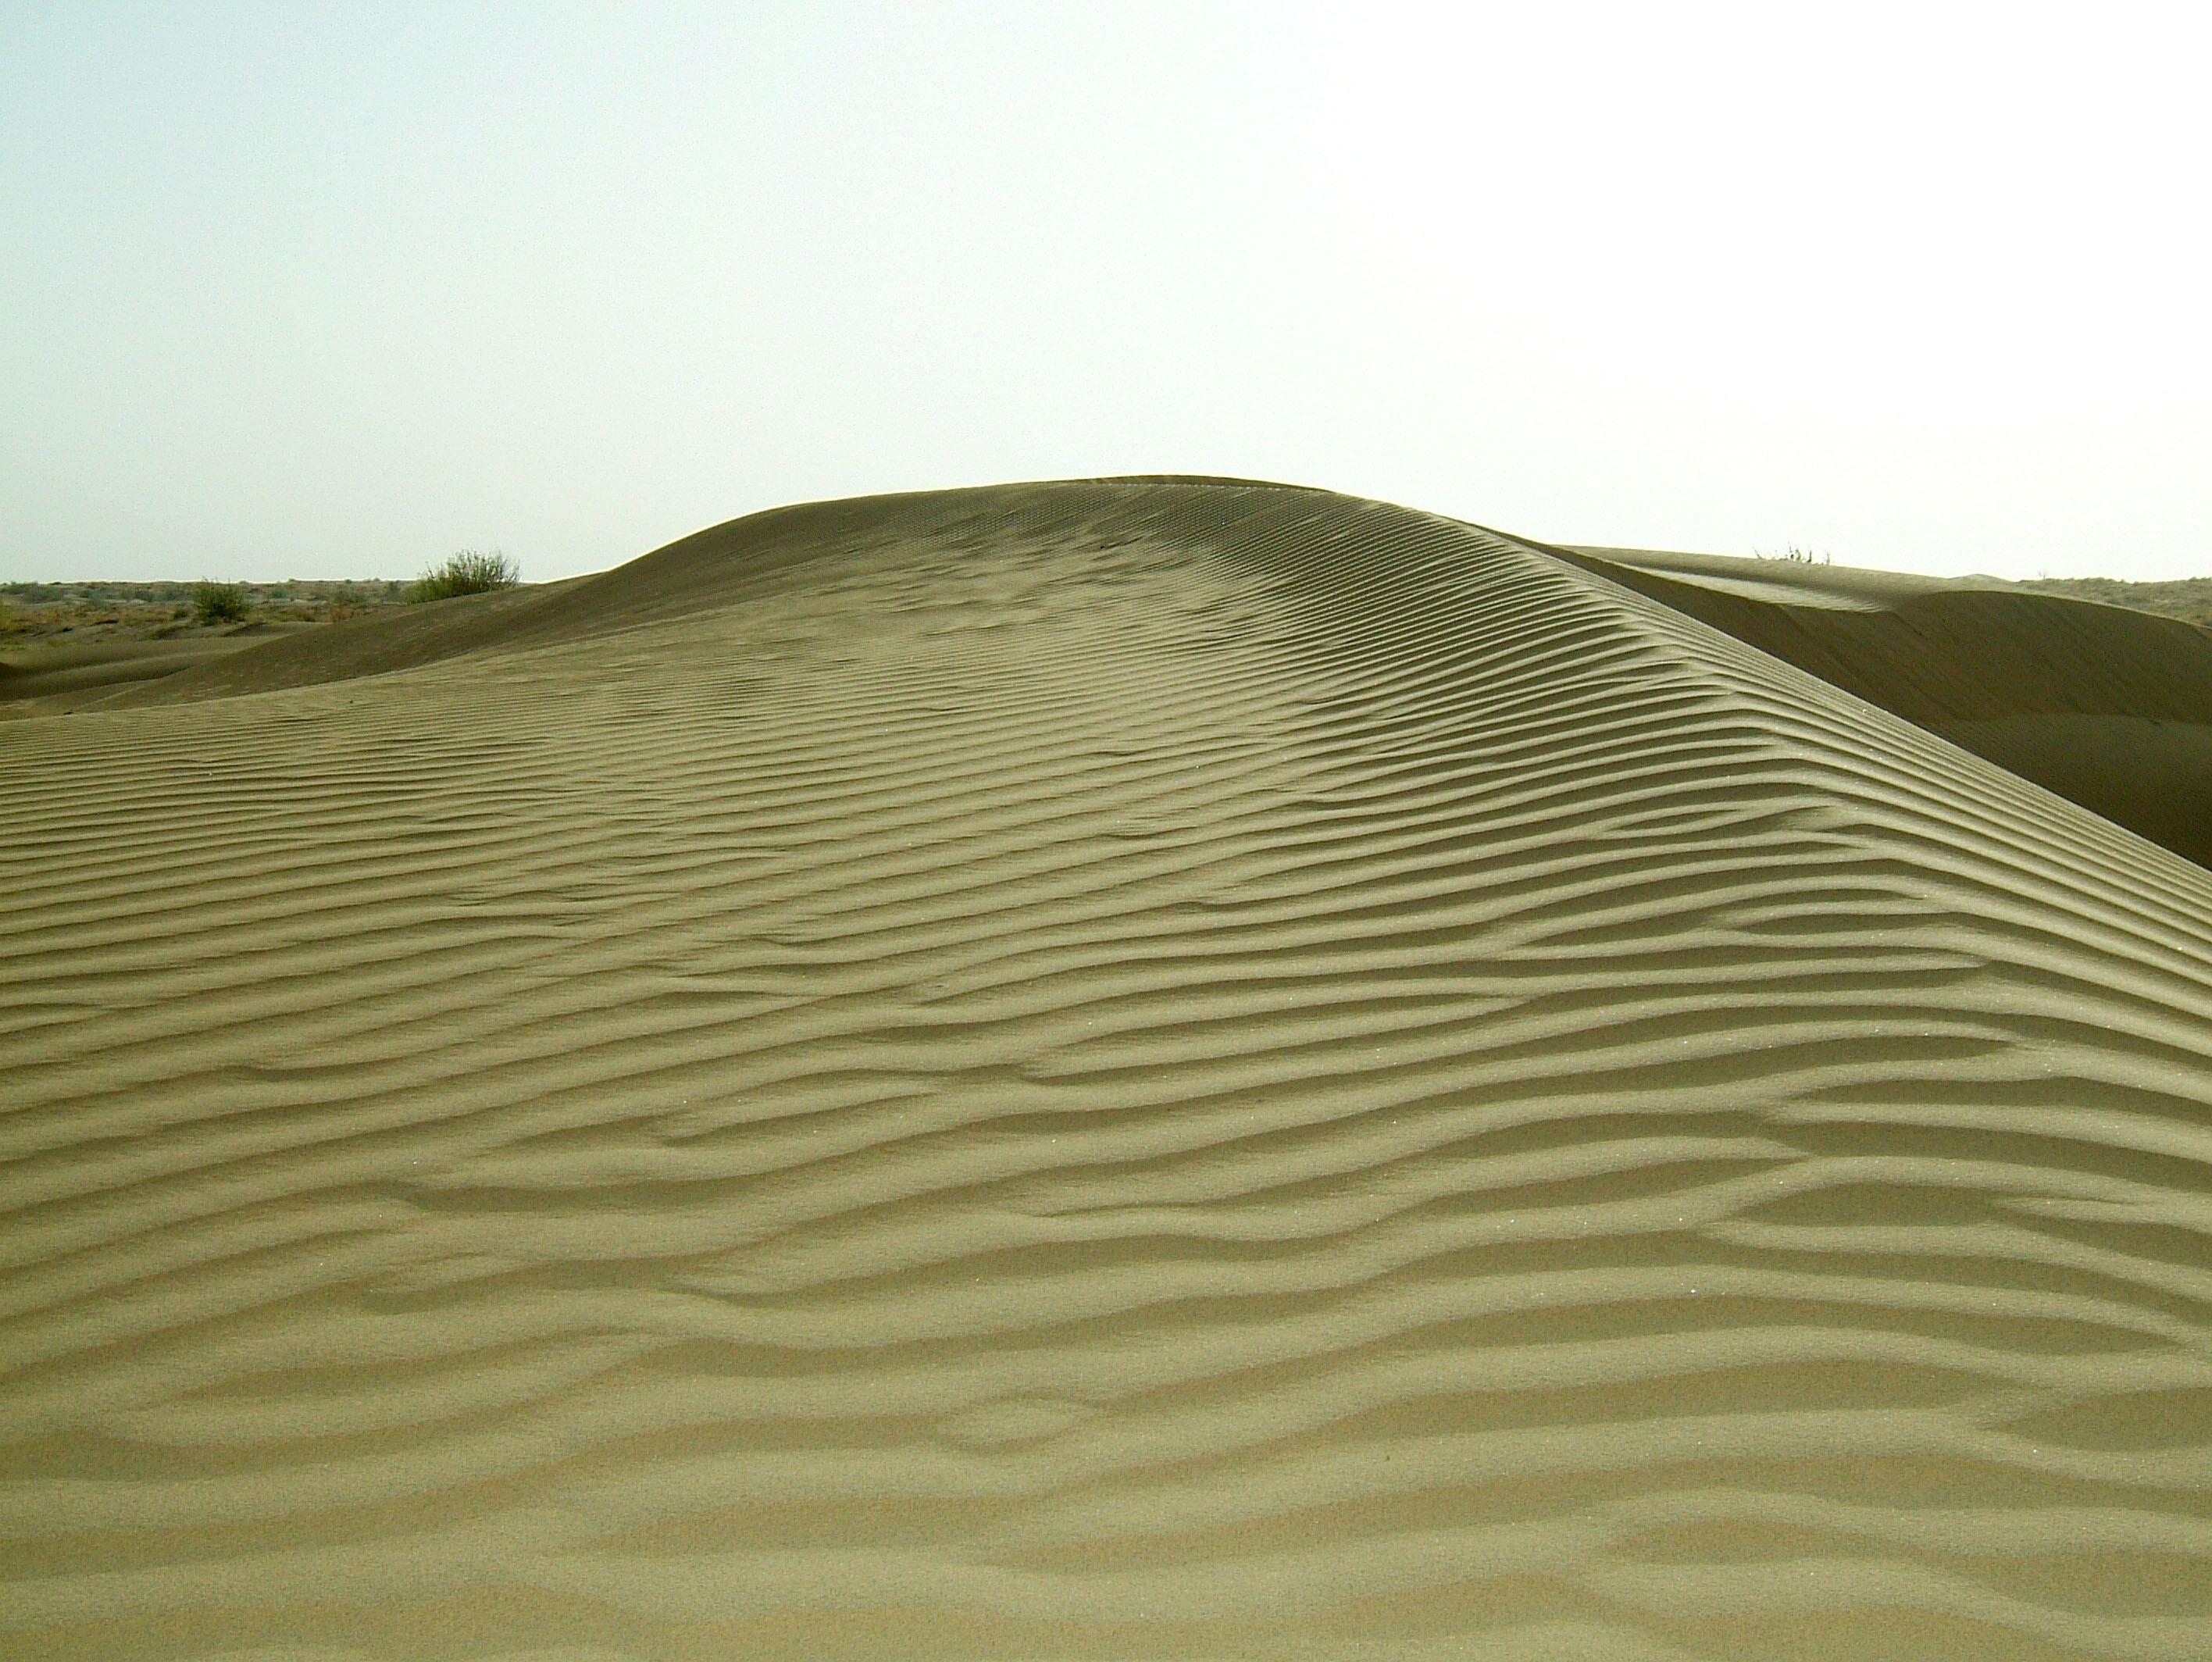 Textures Desert Sand India Rajasthan Jaisalmer 01